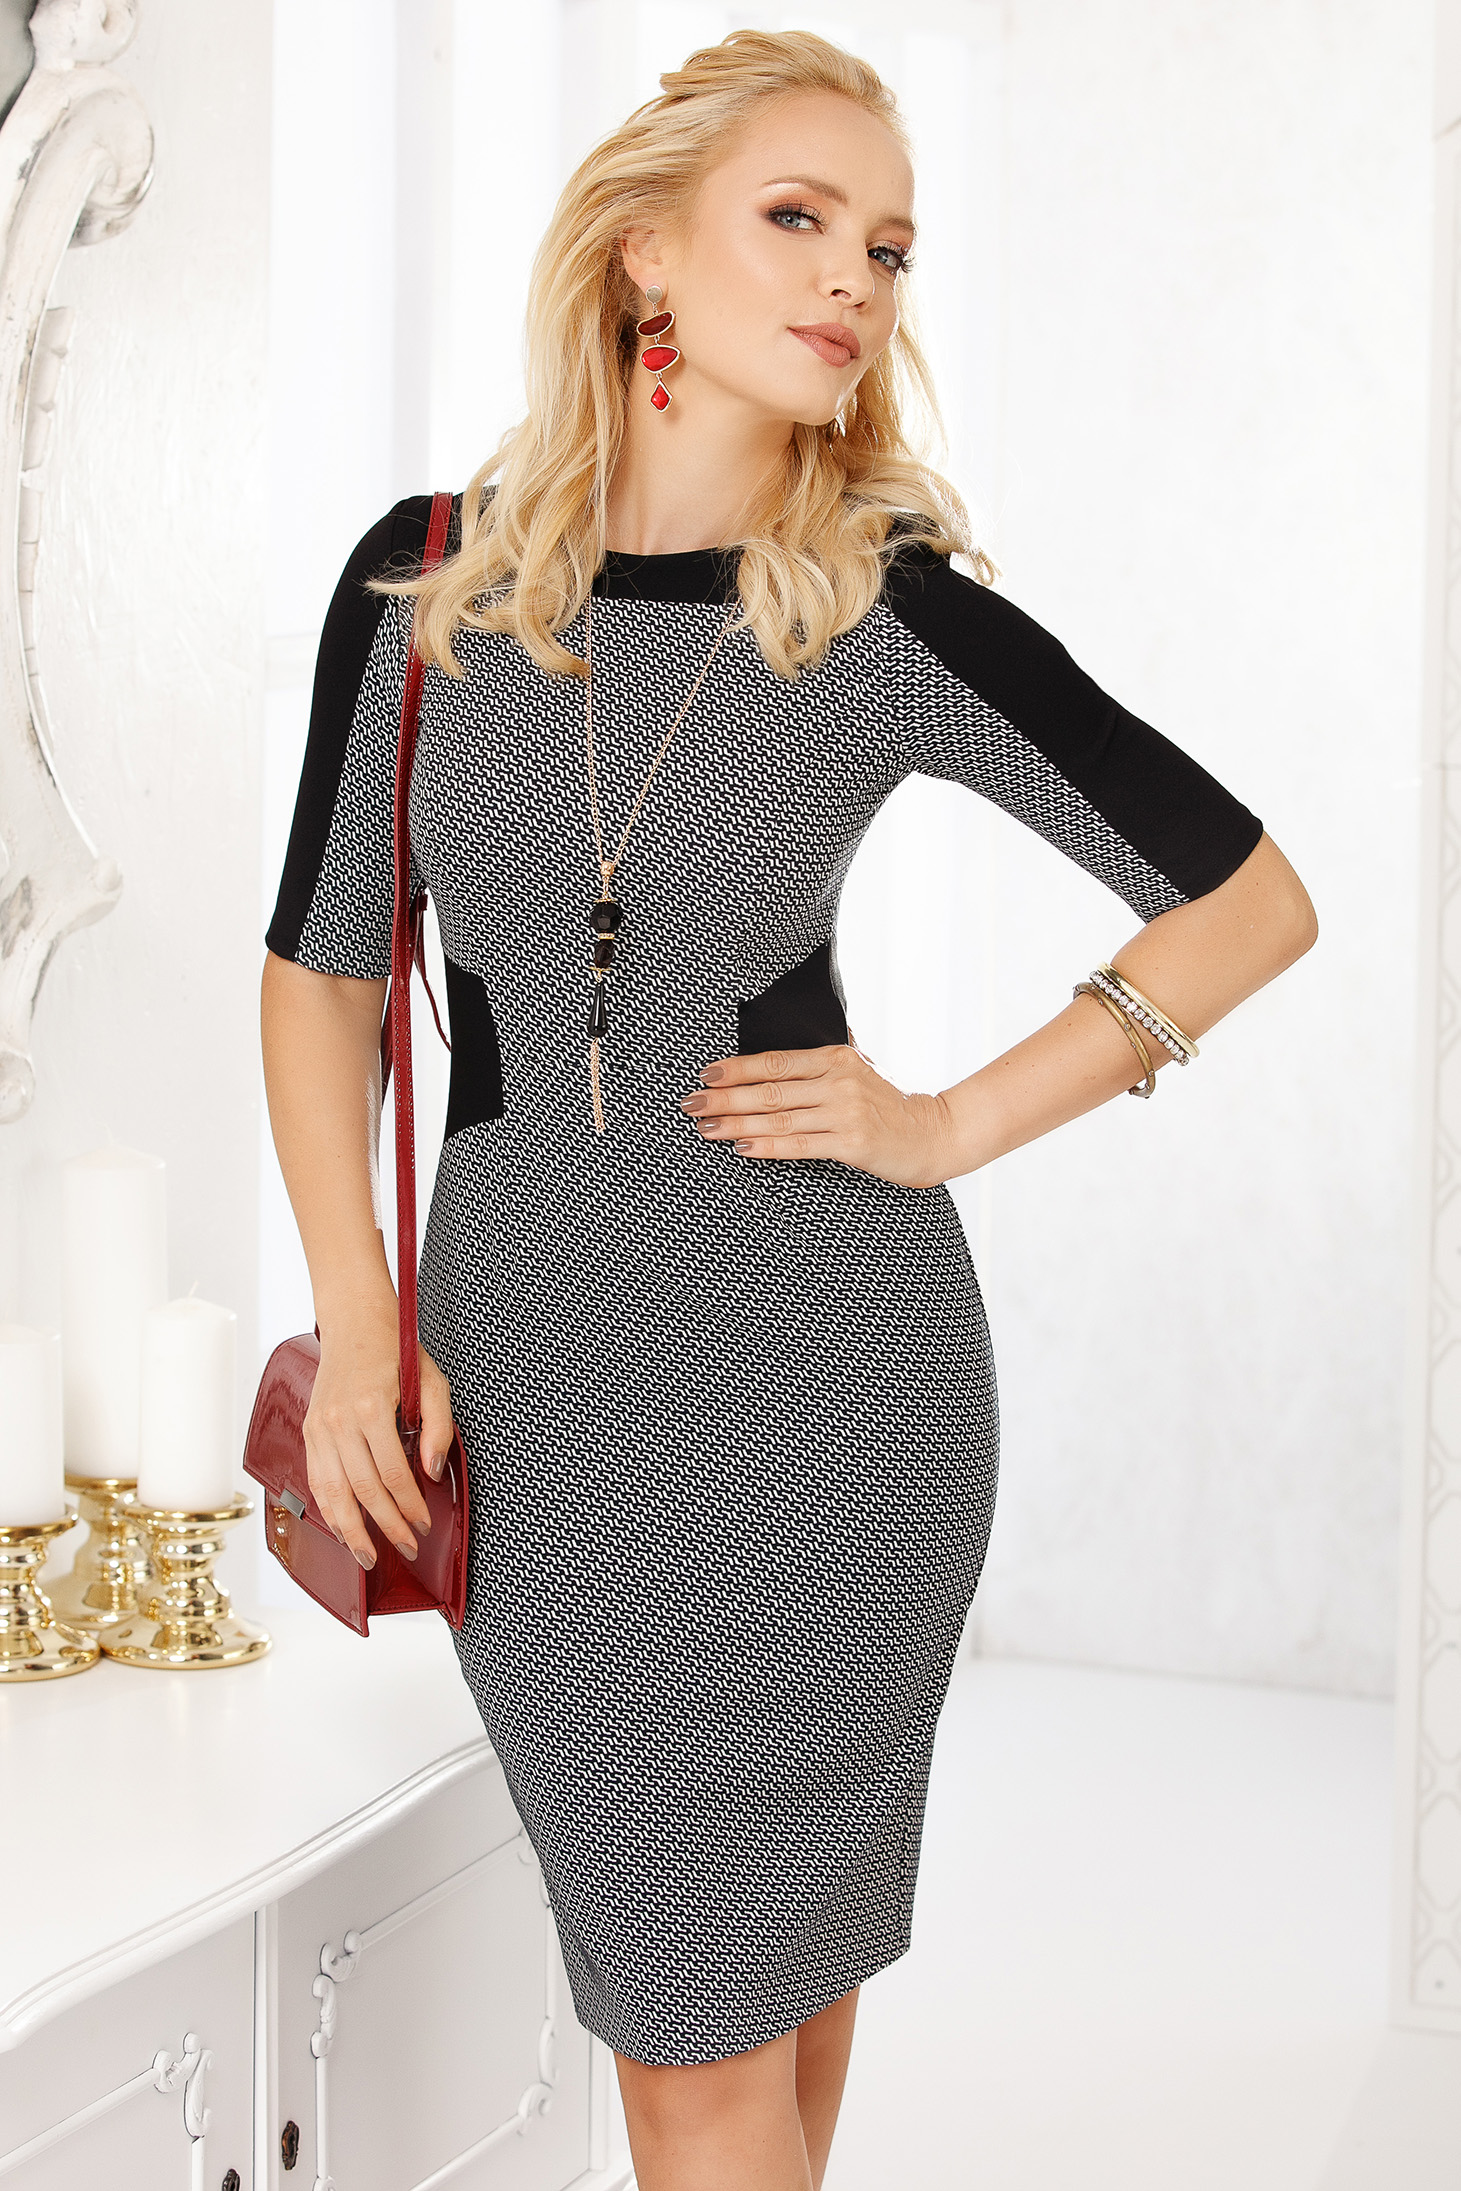 Black dress elegant short cut pencil cloth thin fabric with graphic details neckline